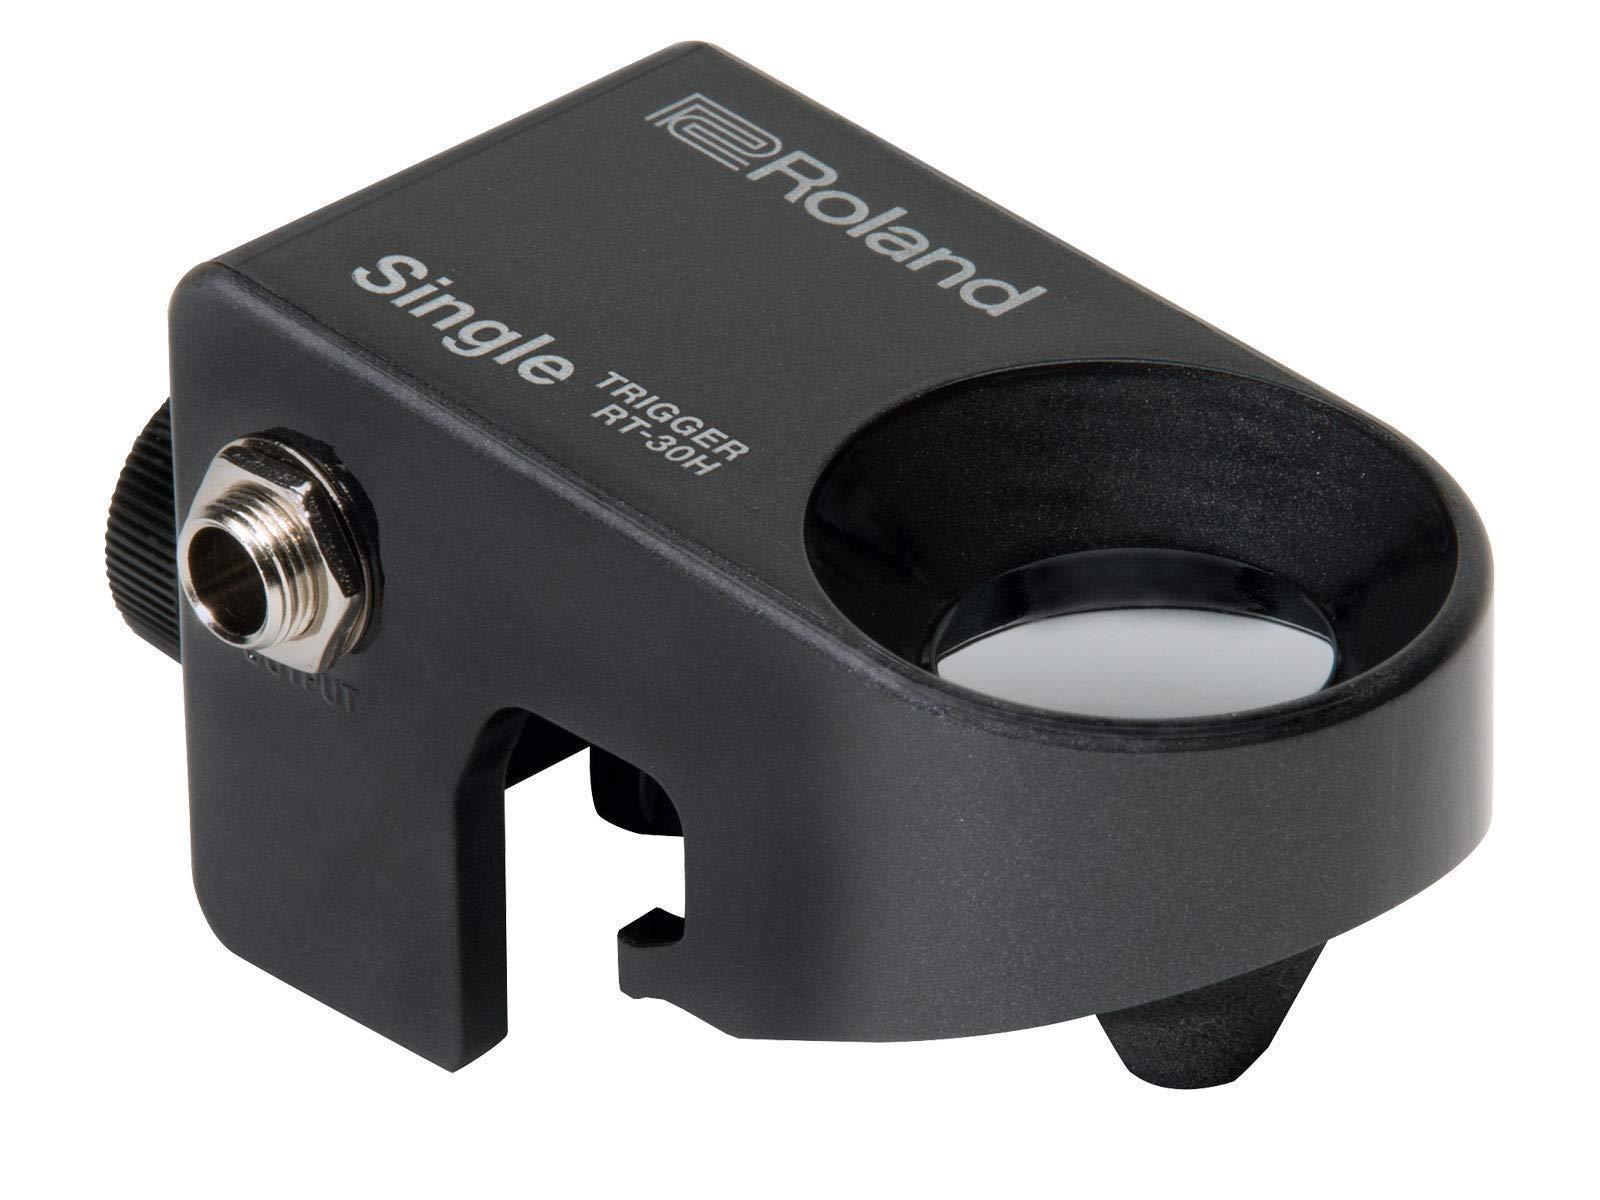 Roland RT-30H Acoustic Drum Trigger For V-Drums and Hybrid Drums